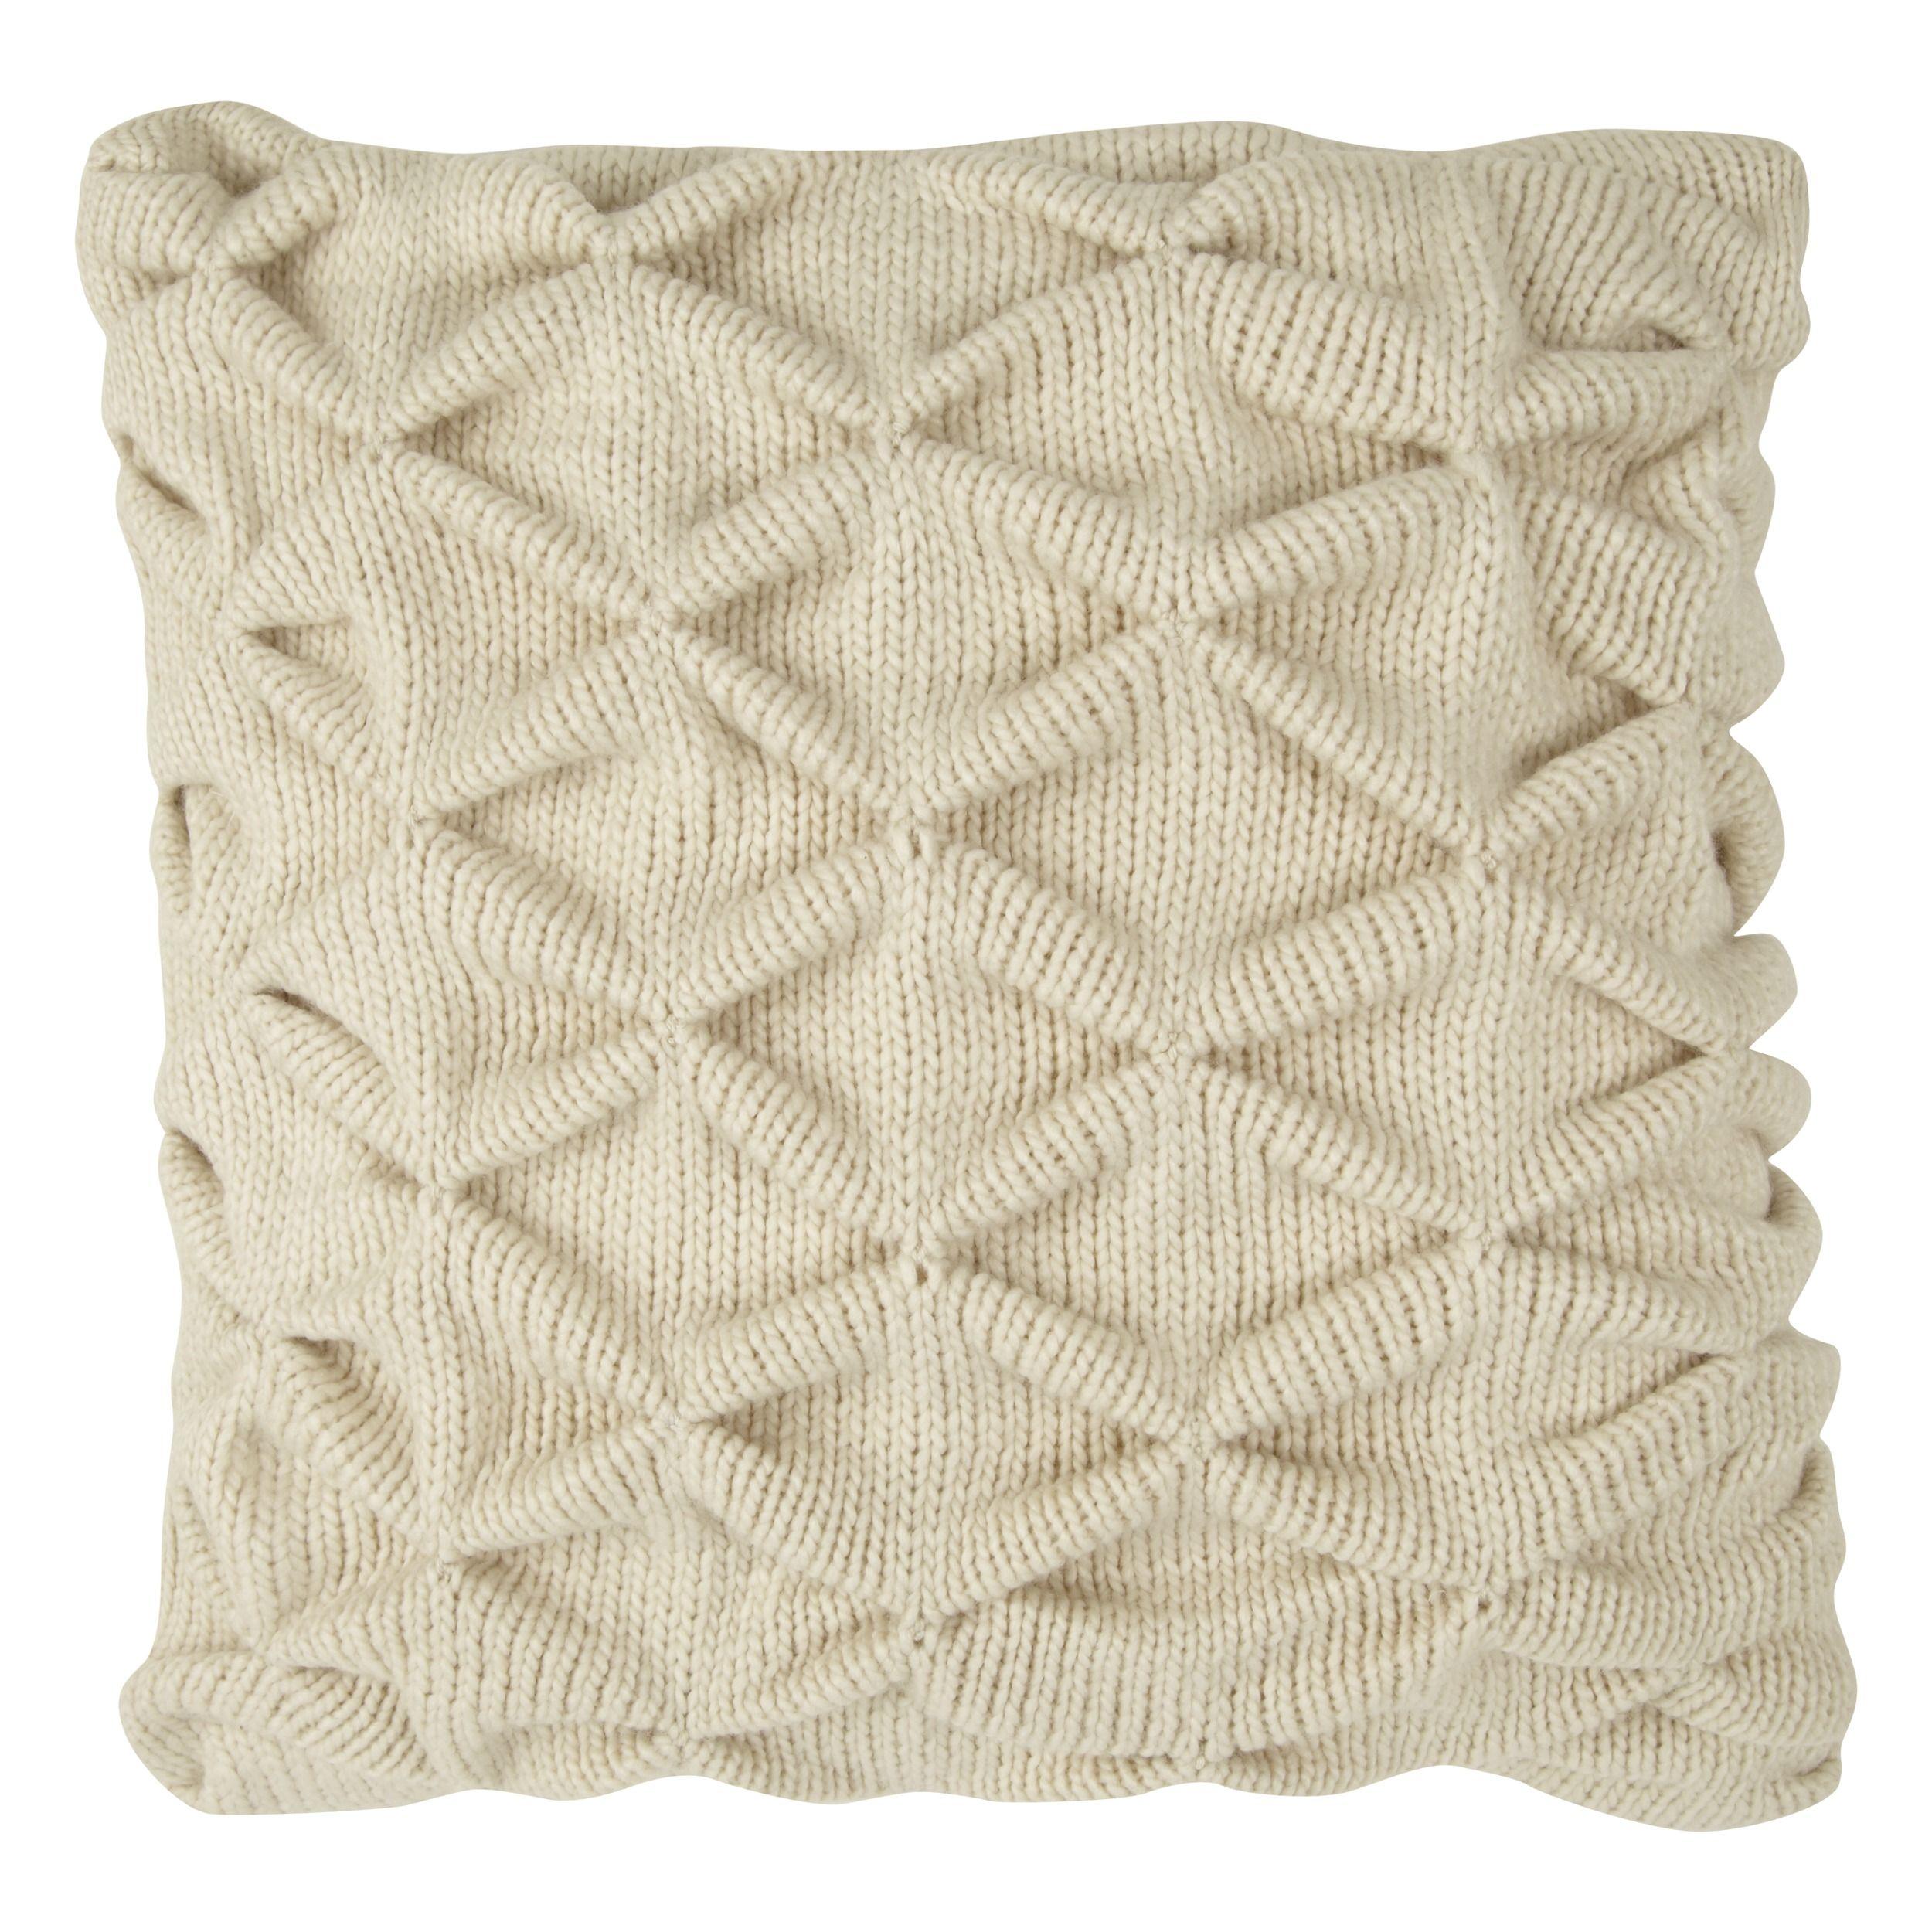 Trellis Natural Knit Cushion | Craft ideas | Pinterest | Room